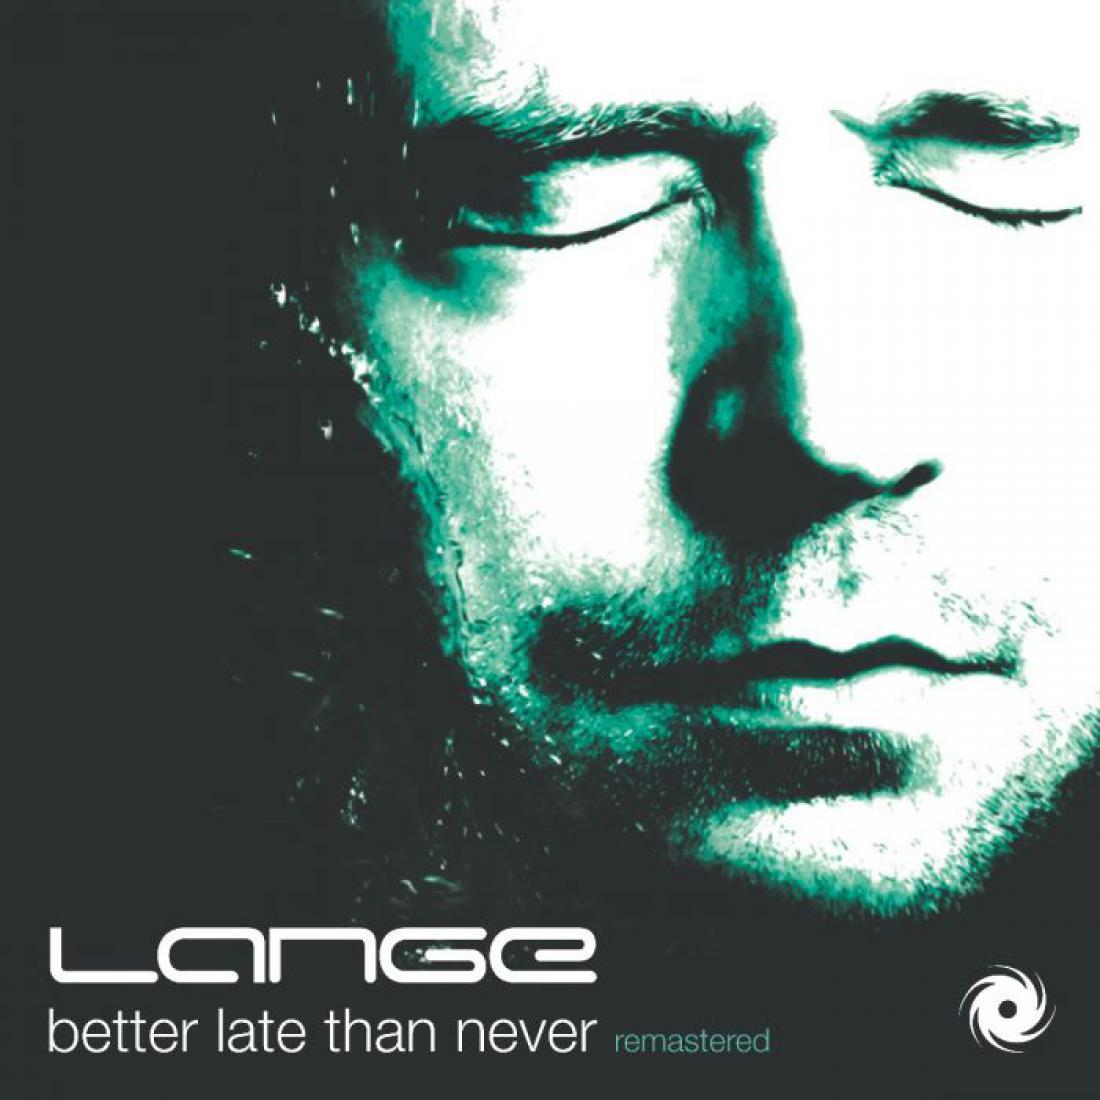 Album: Lange - Better Late Than Never [Remastered]